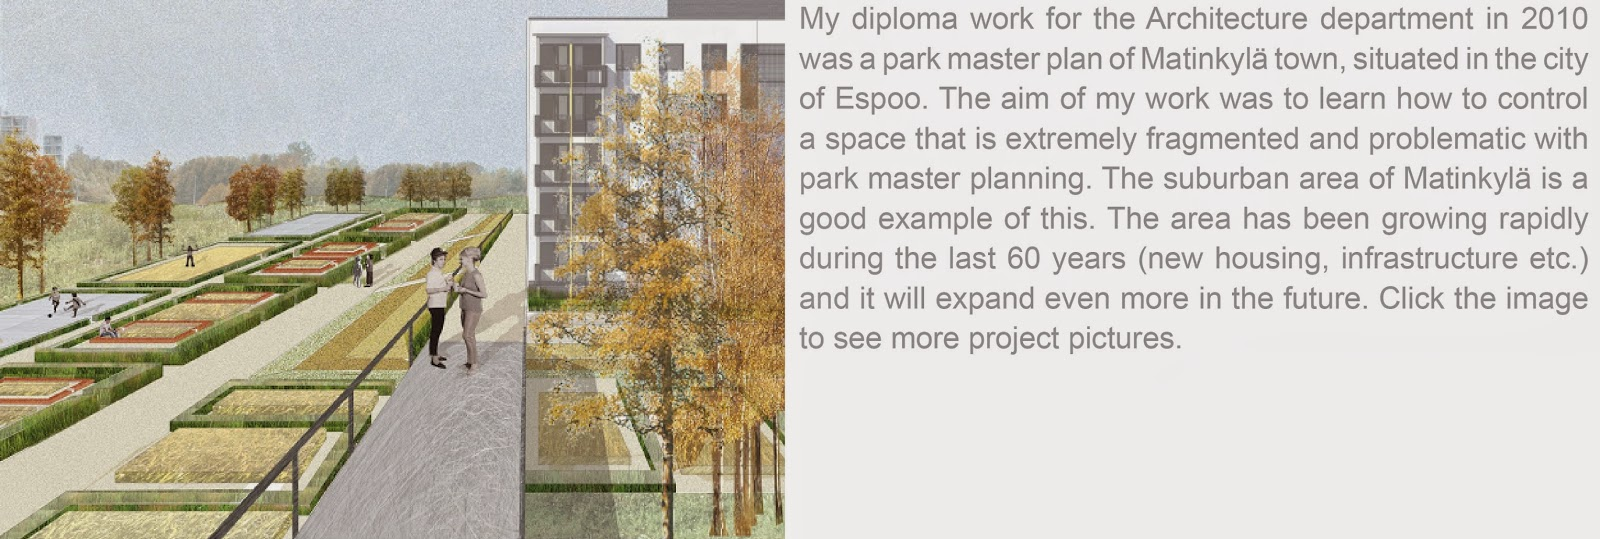 http://www.escapes.fi/p/diplomawork.html